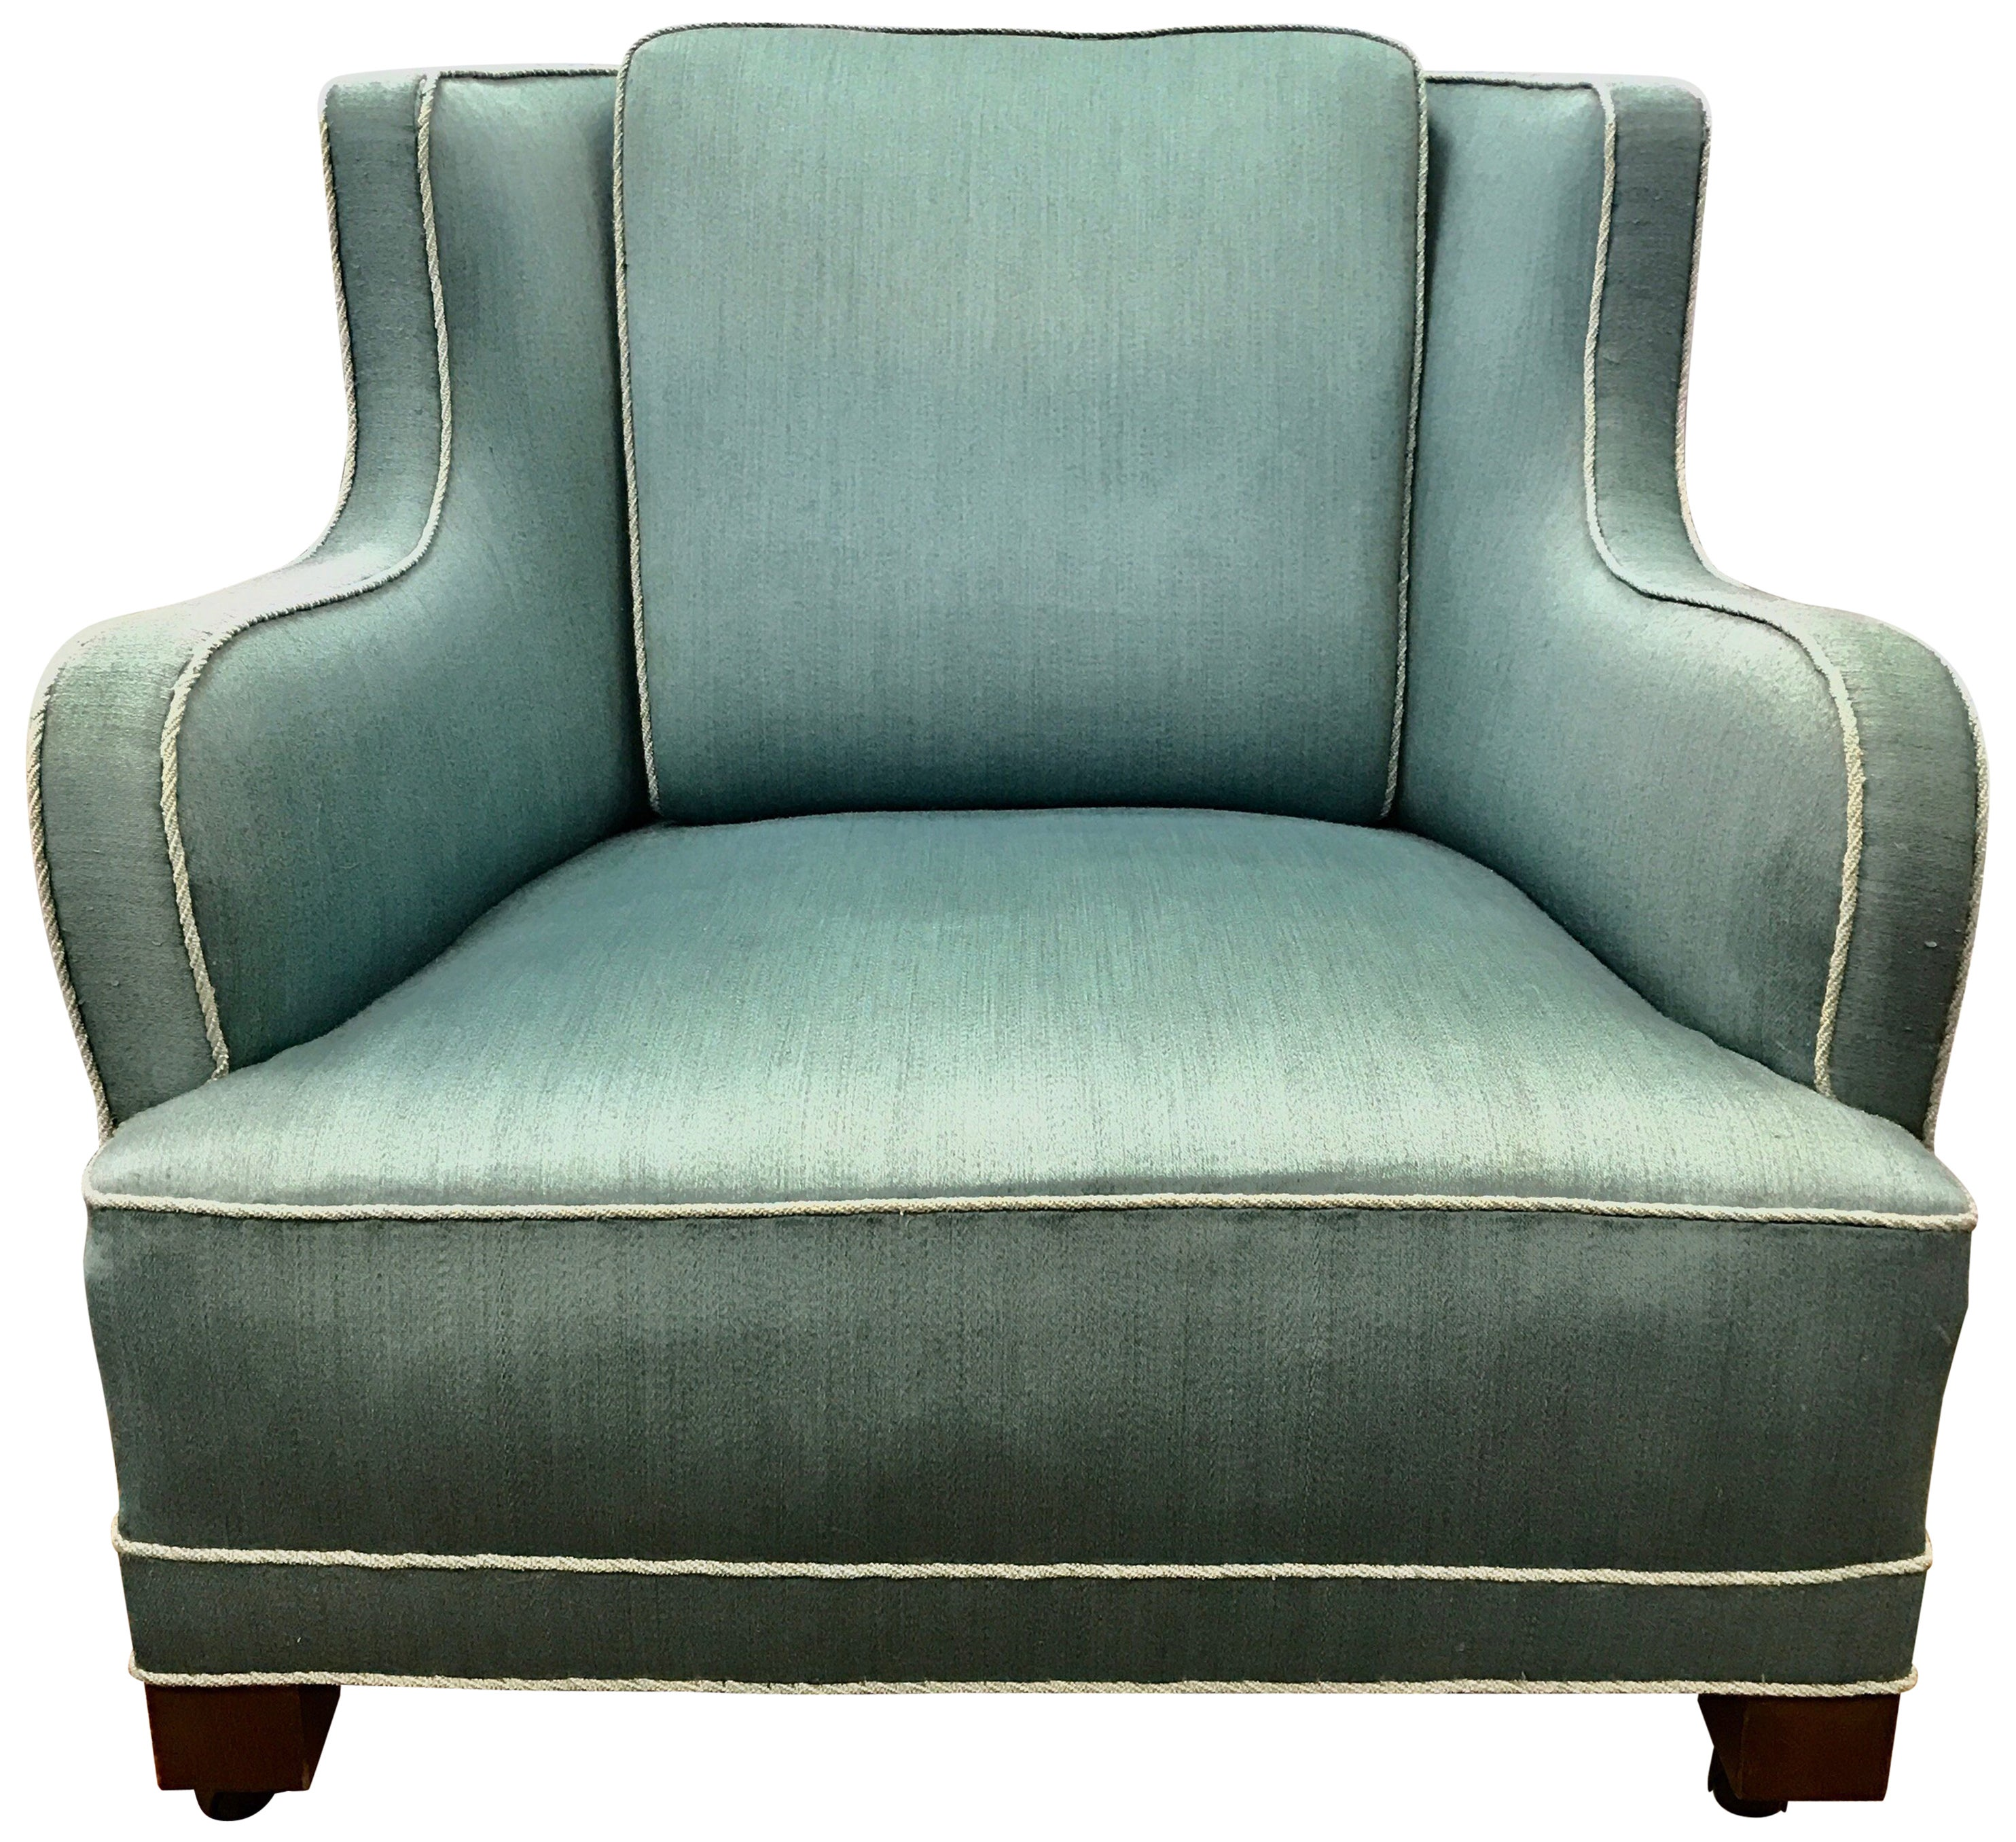 Danish Modern Upholstered Wool Aquamarine Blue Lounge Chair